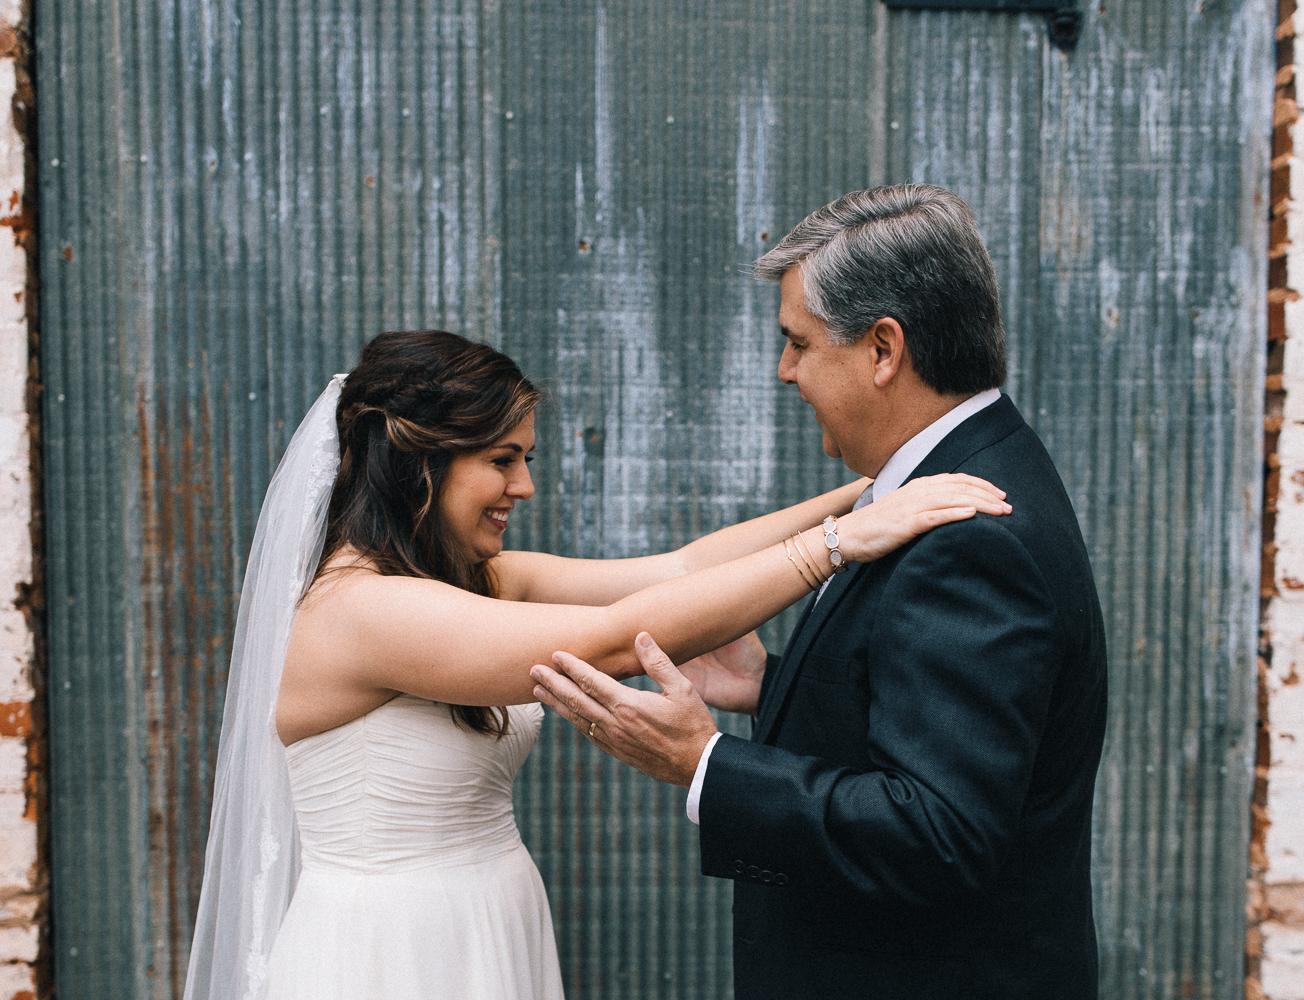 2018_03_ 10The Richardson Wedding Blog Photos Edited For Web 0062.jpg